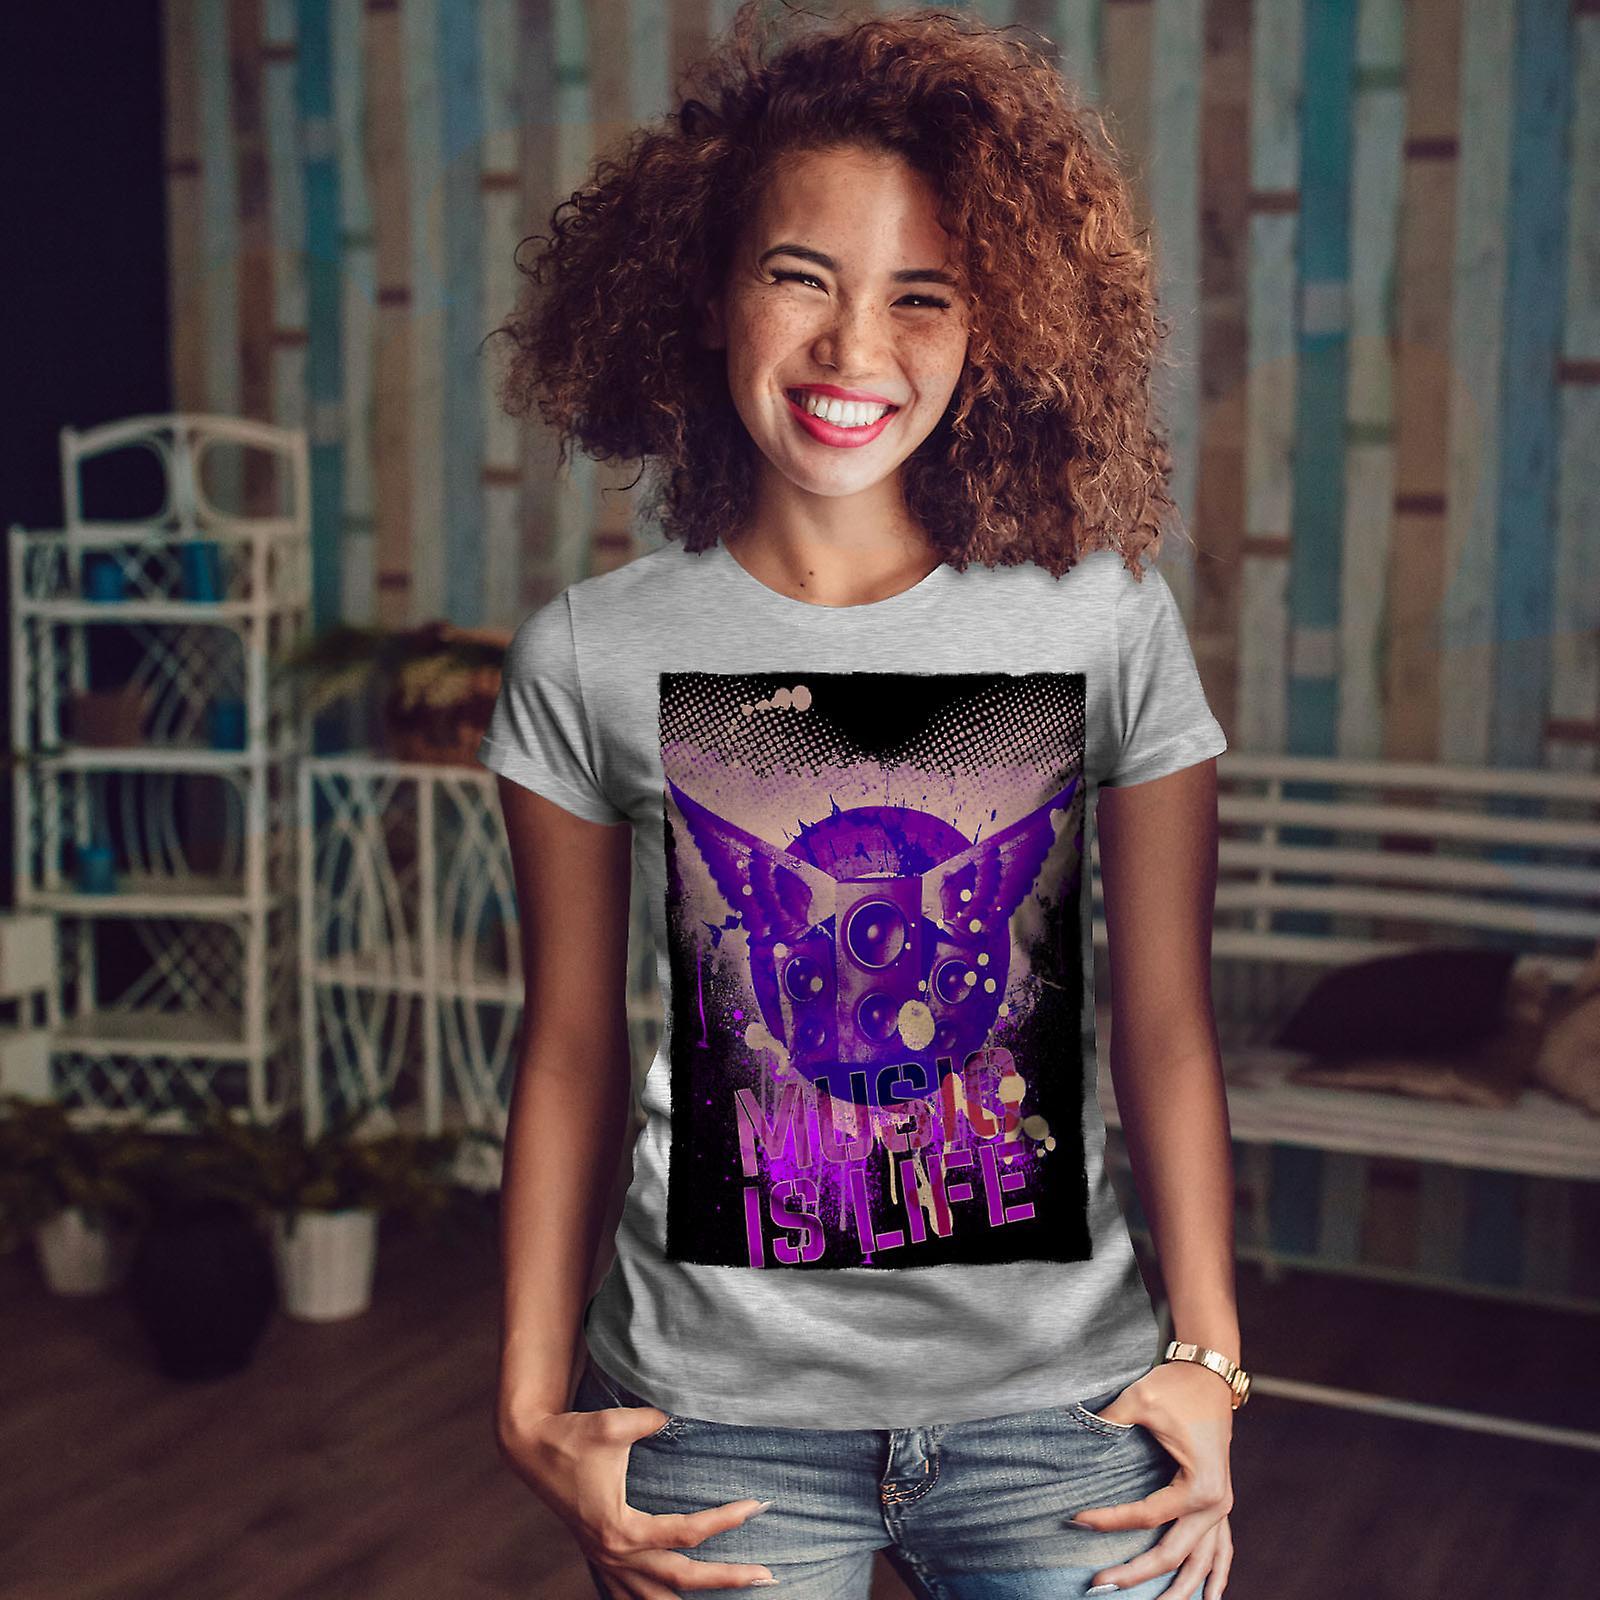 Maison de vie danse musique GreyT-chemise femme   Wellcoda